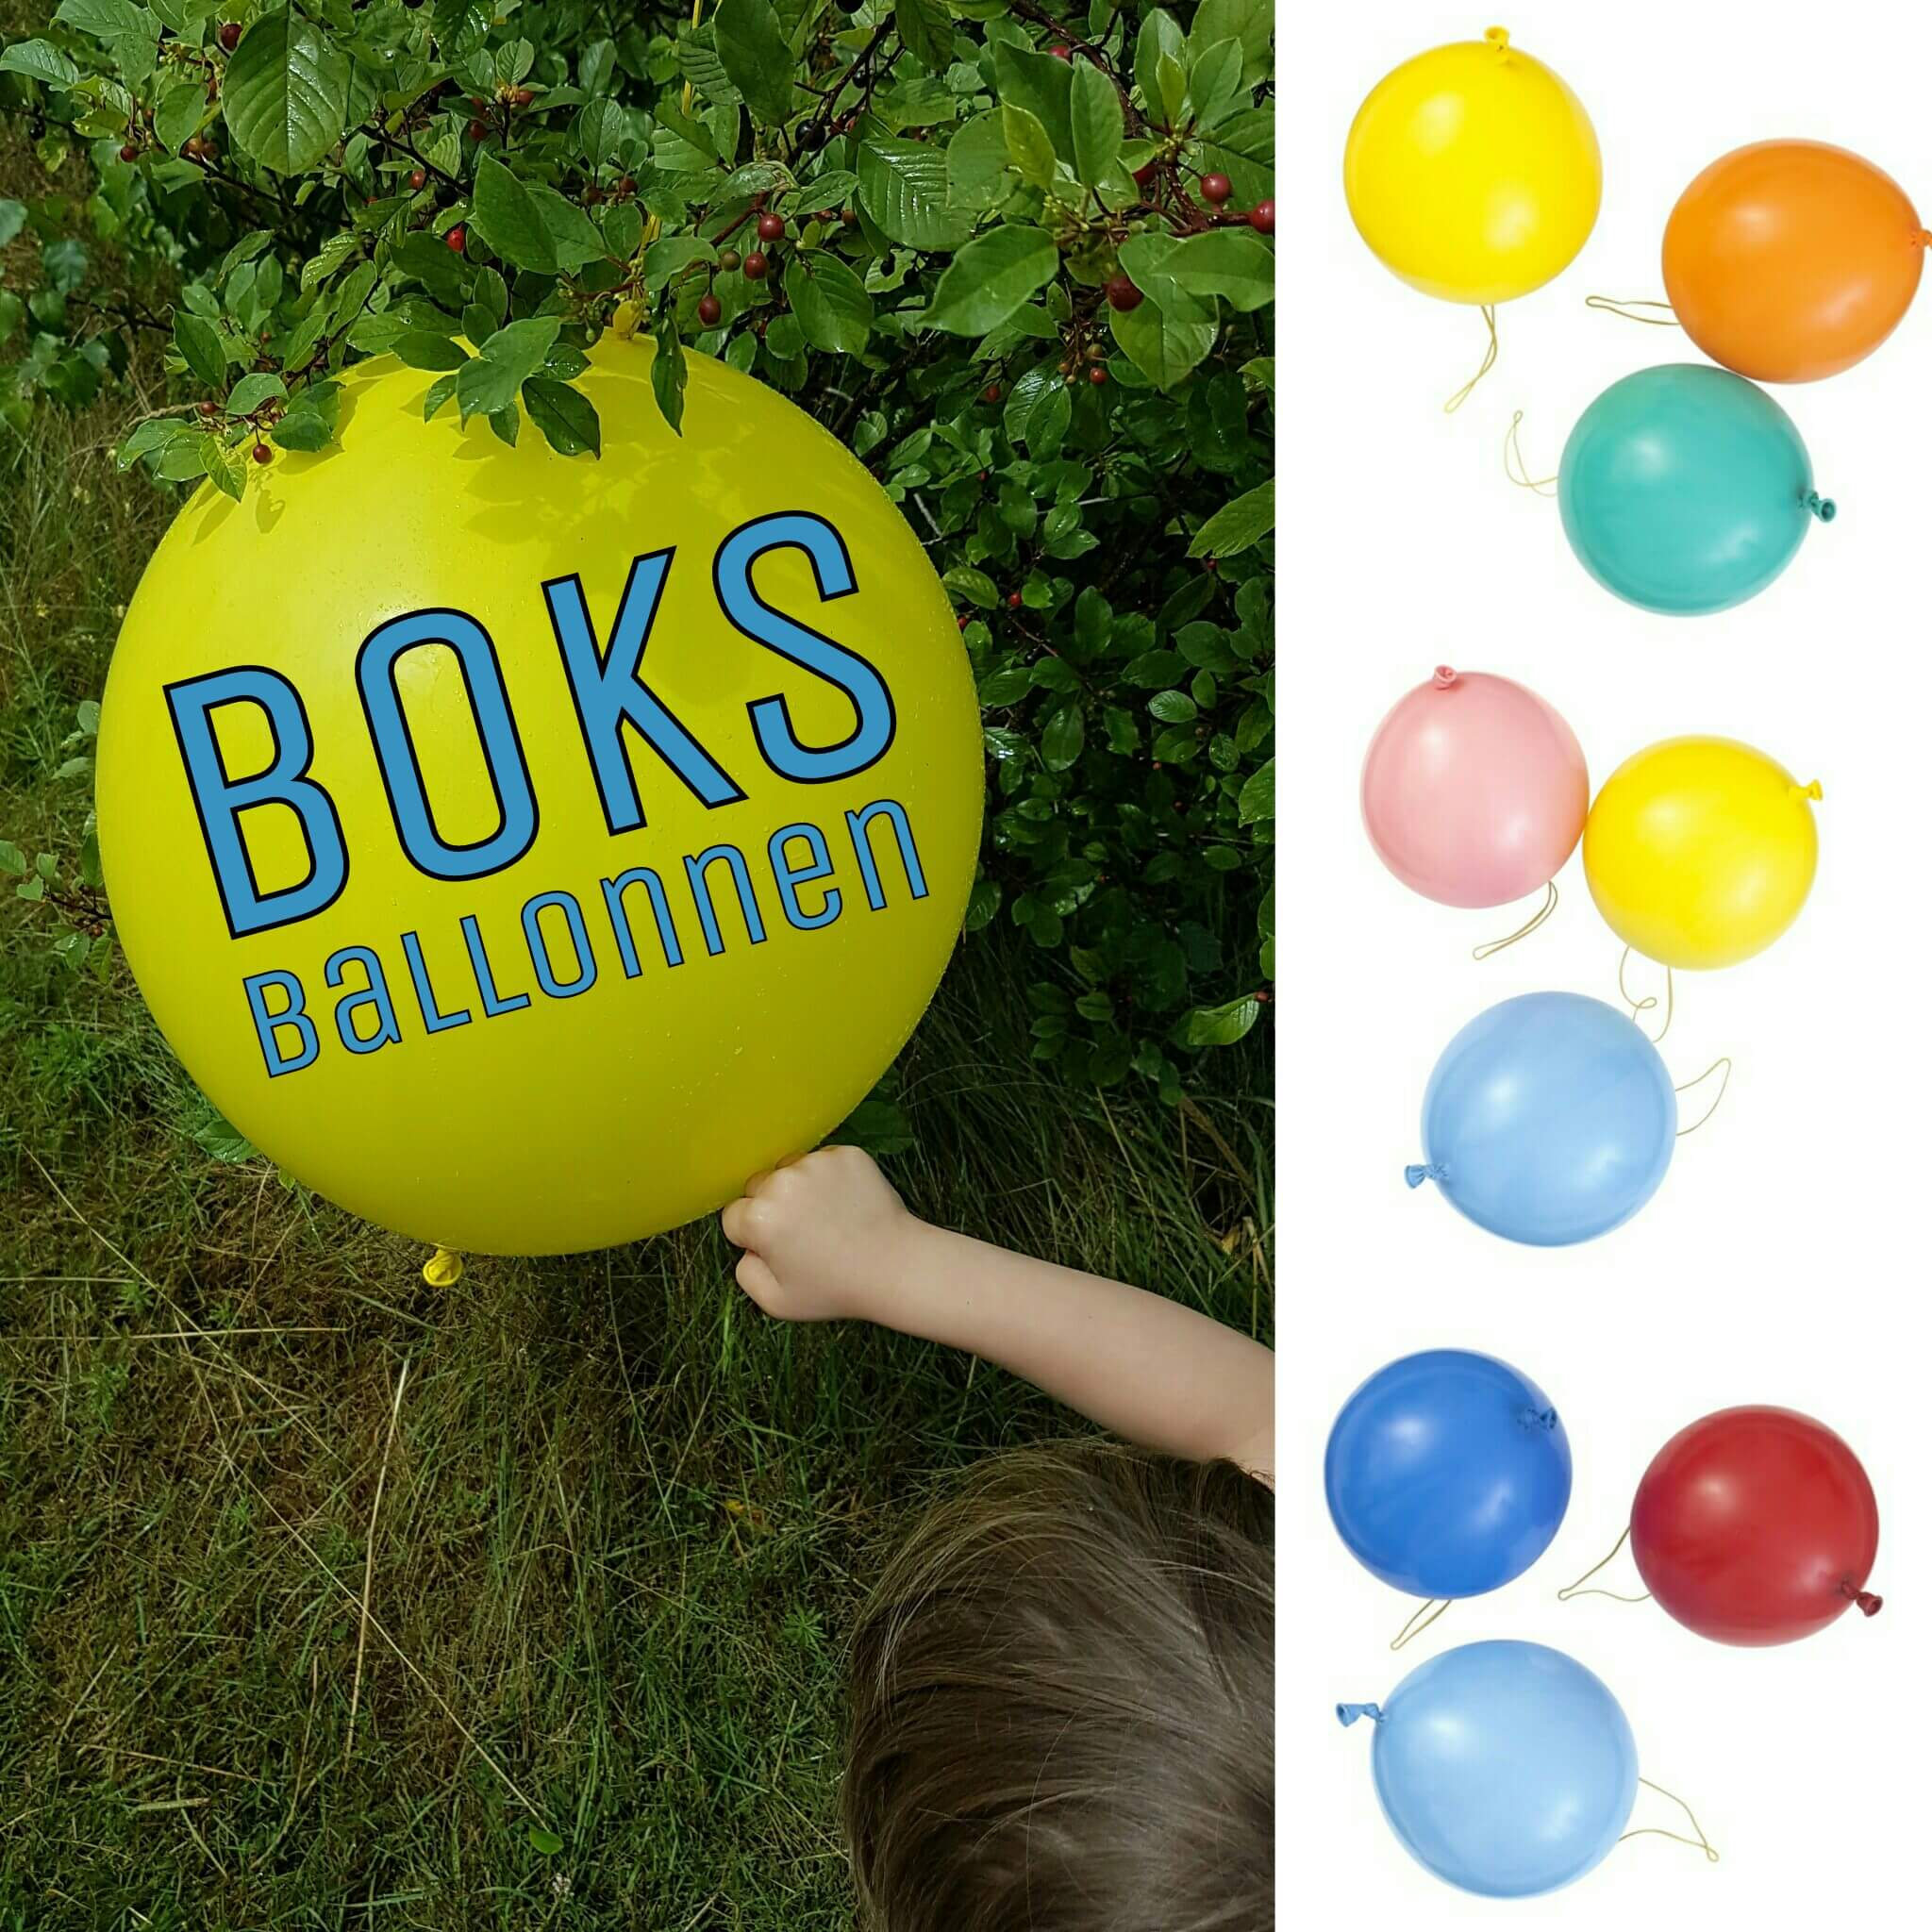 boks ballonnen